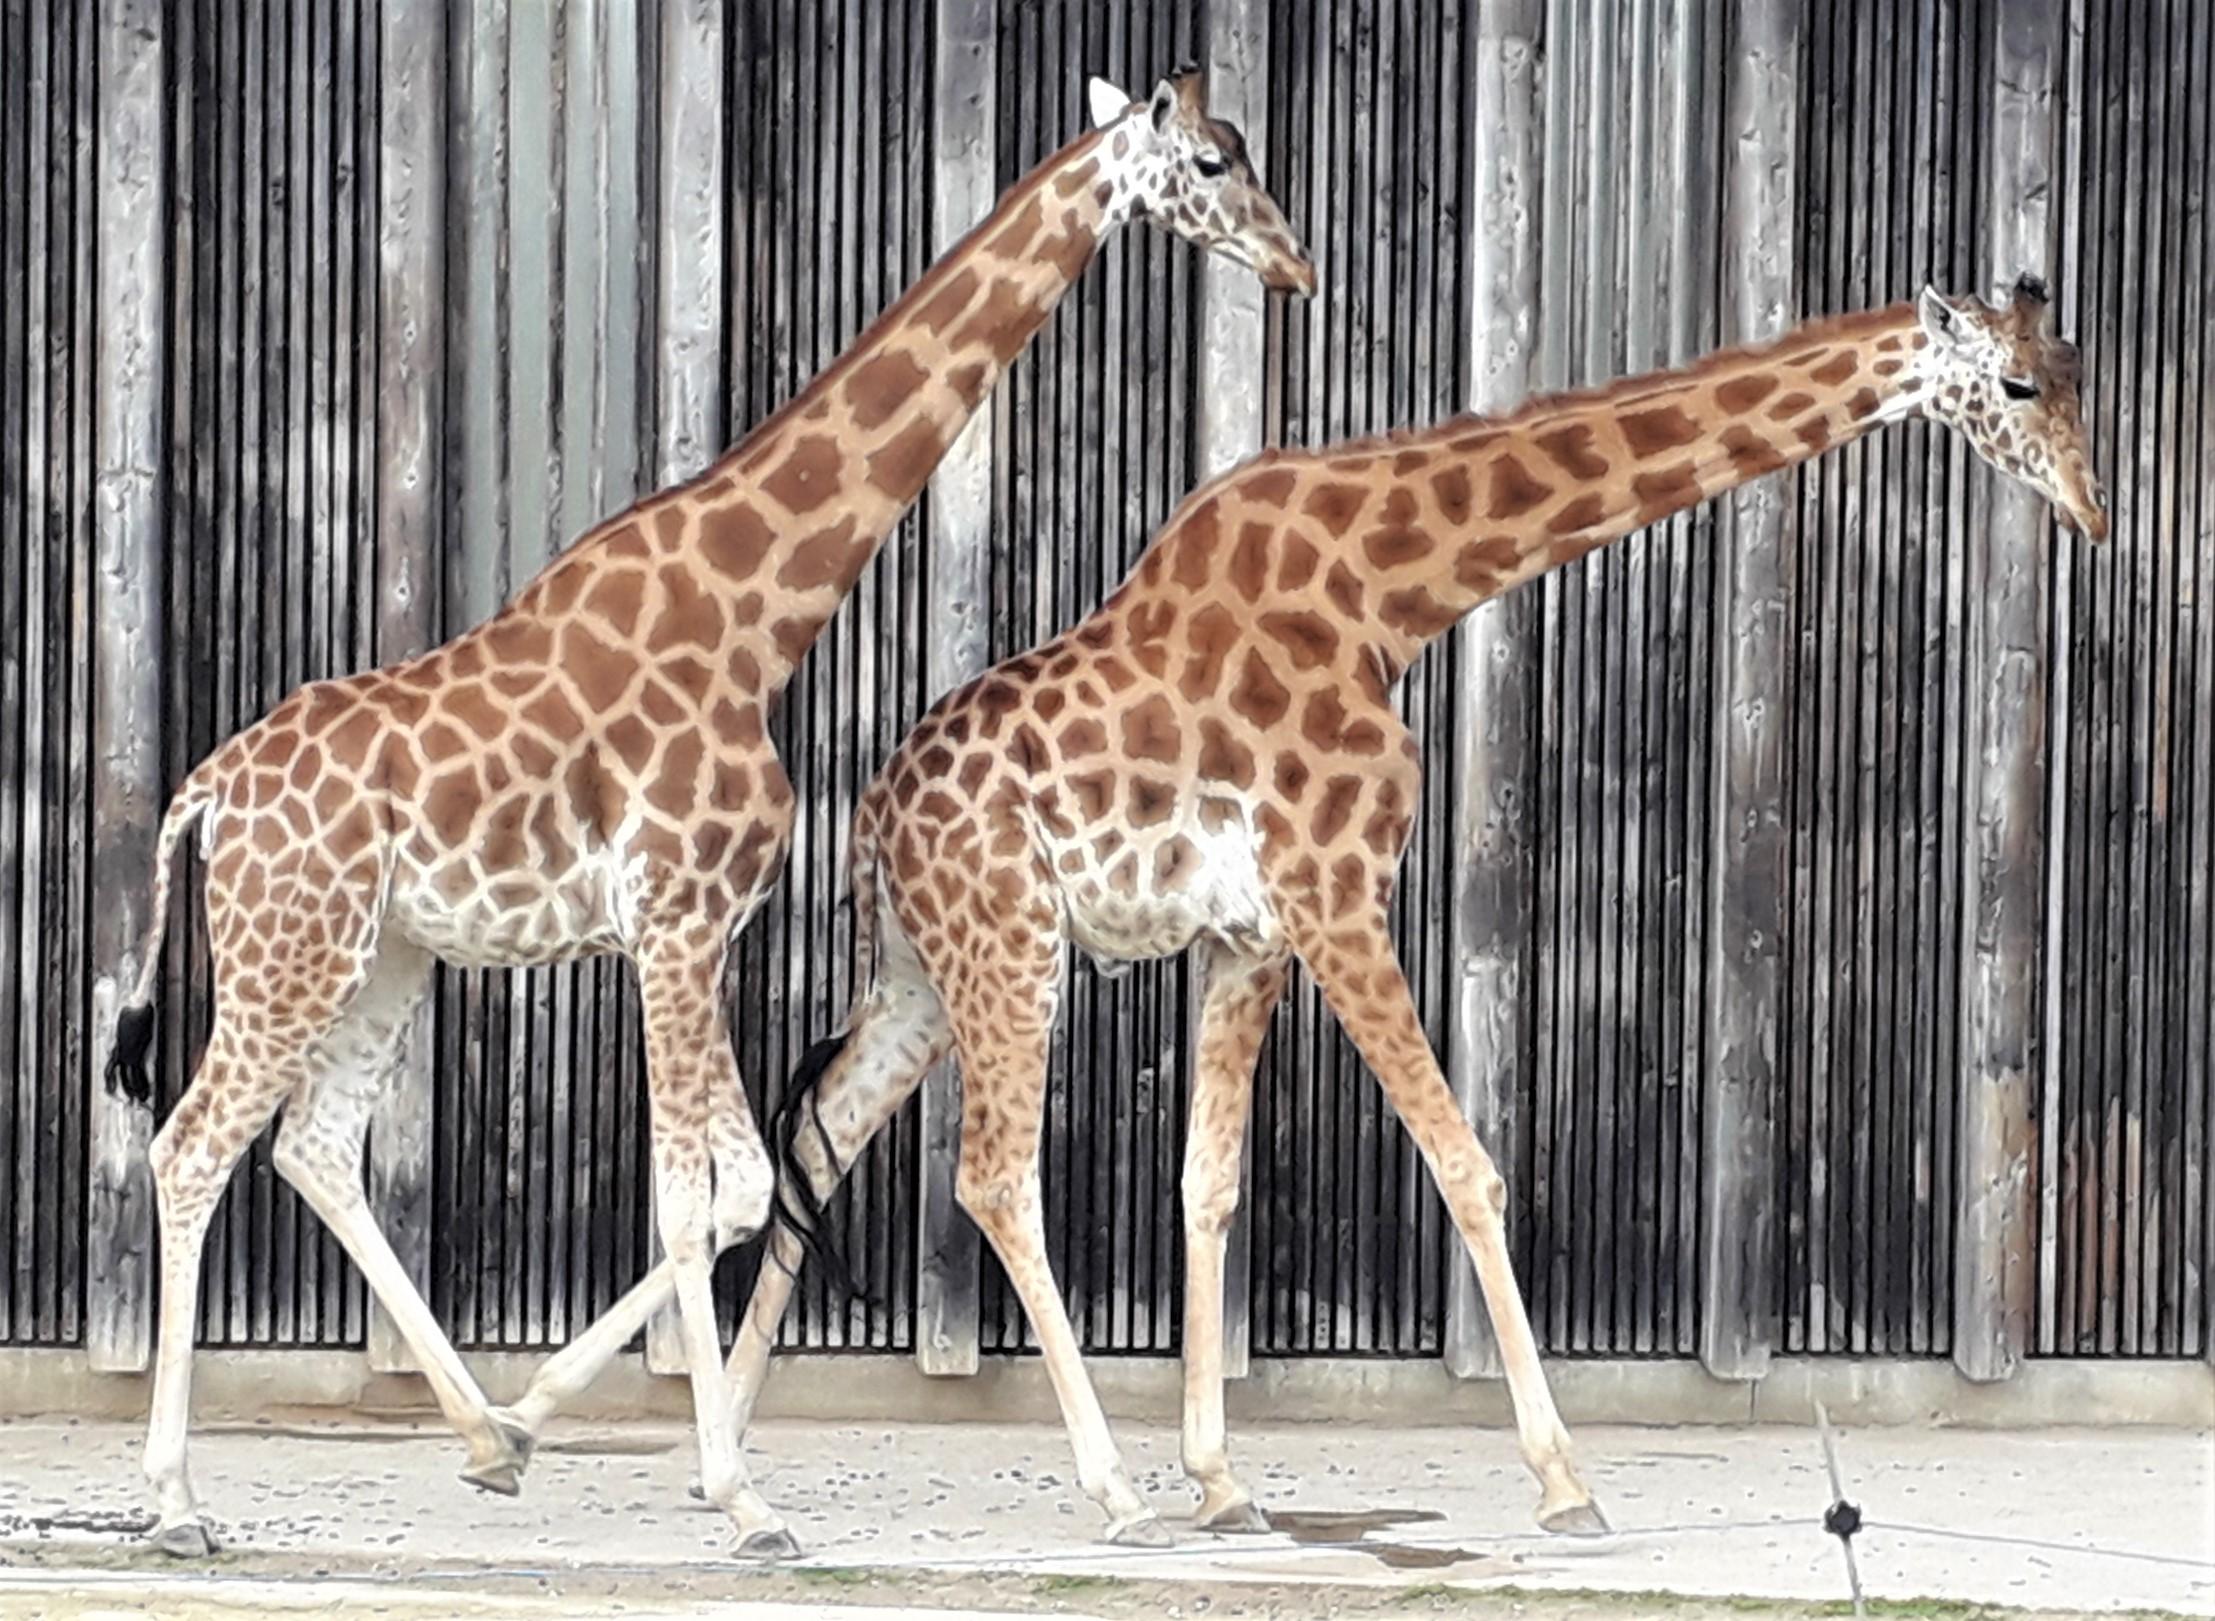 Girafes Parc de la Tête d'Or Lyon zoo rut chaleur parade